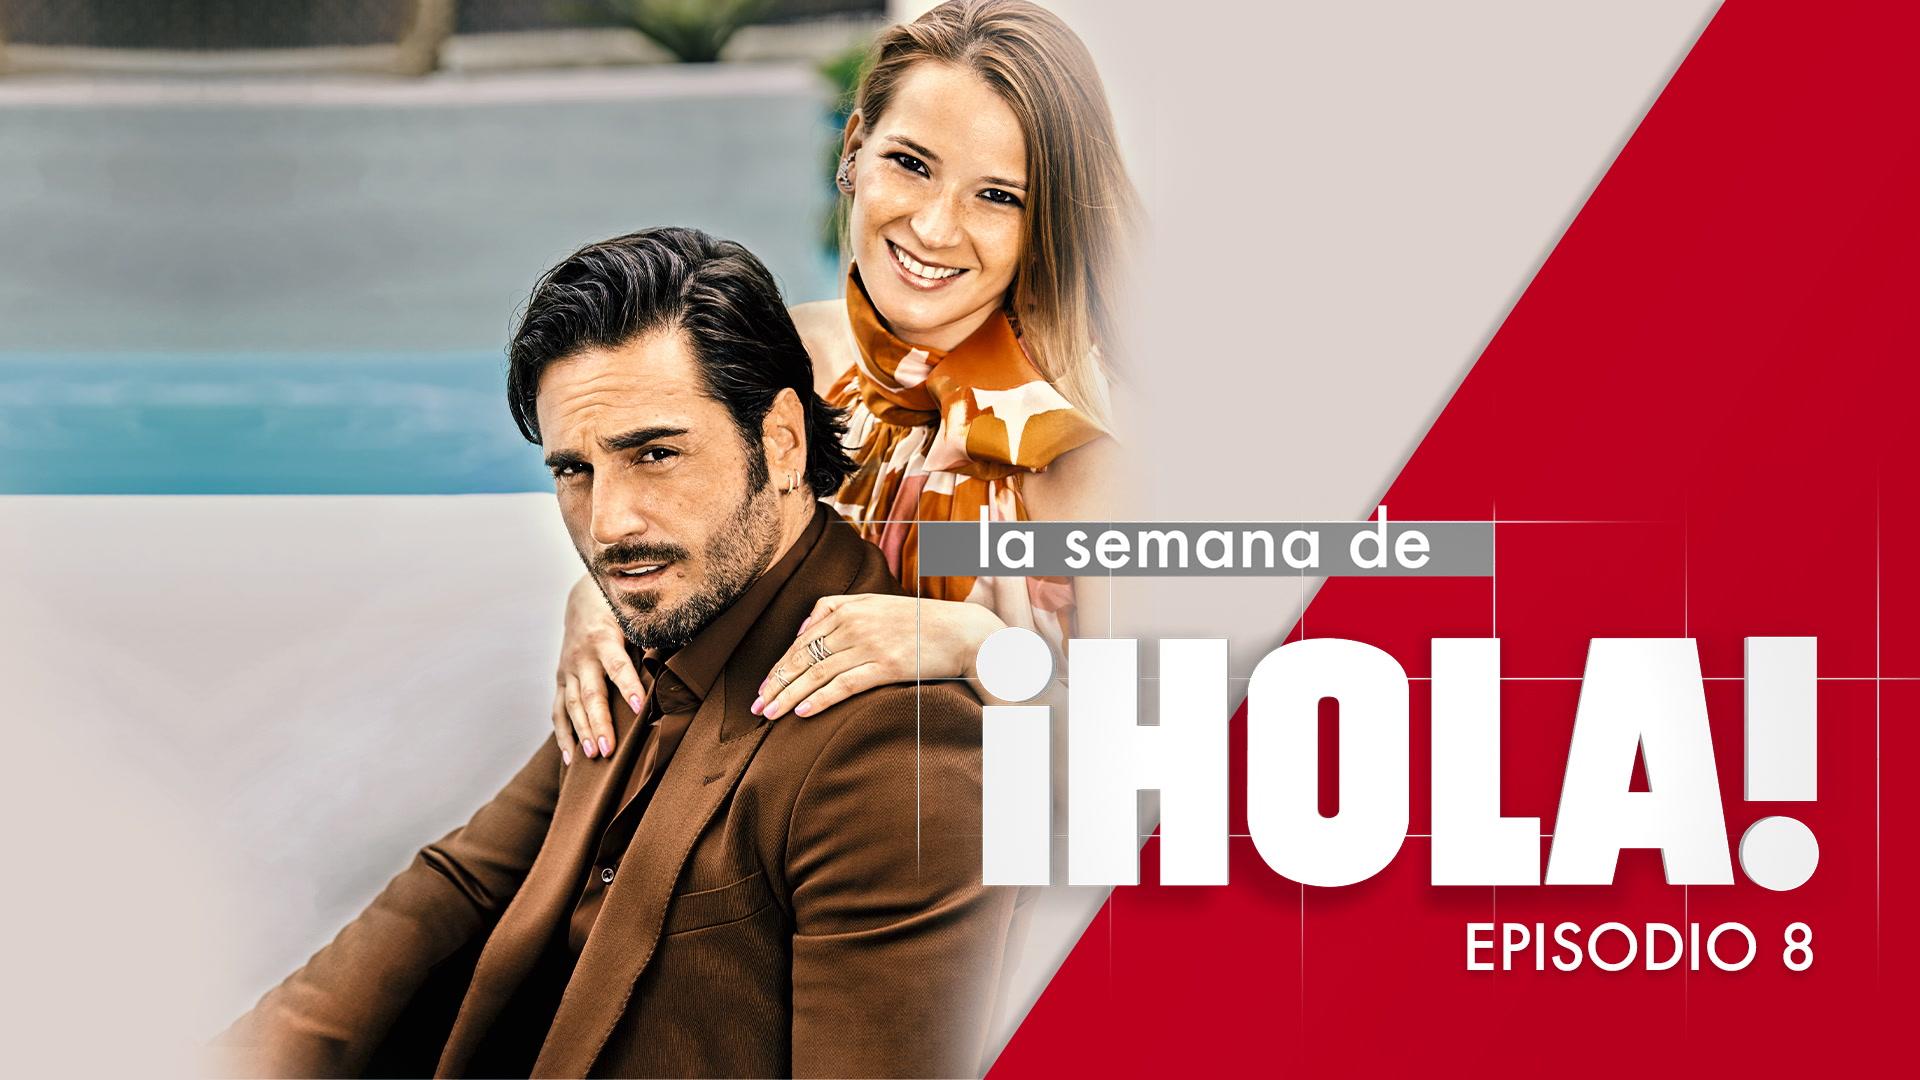 La semana de ¡HOLA! - Episodio 8